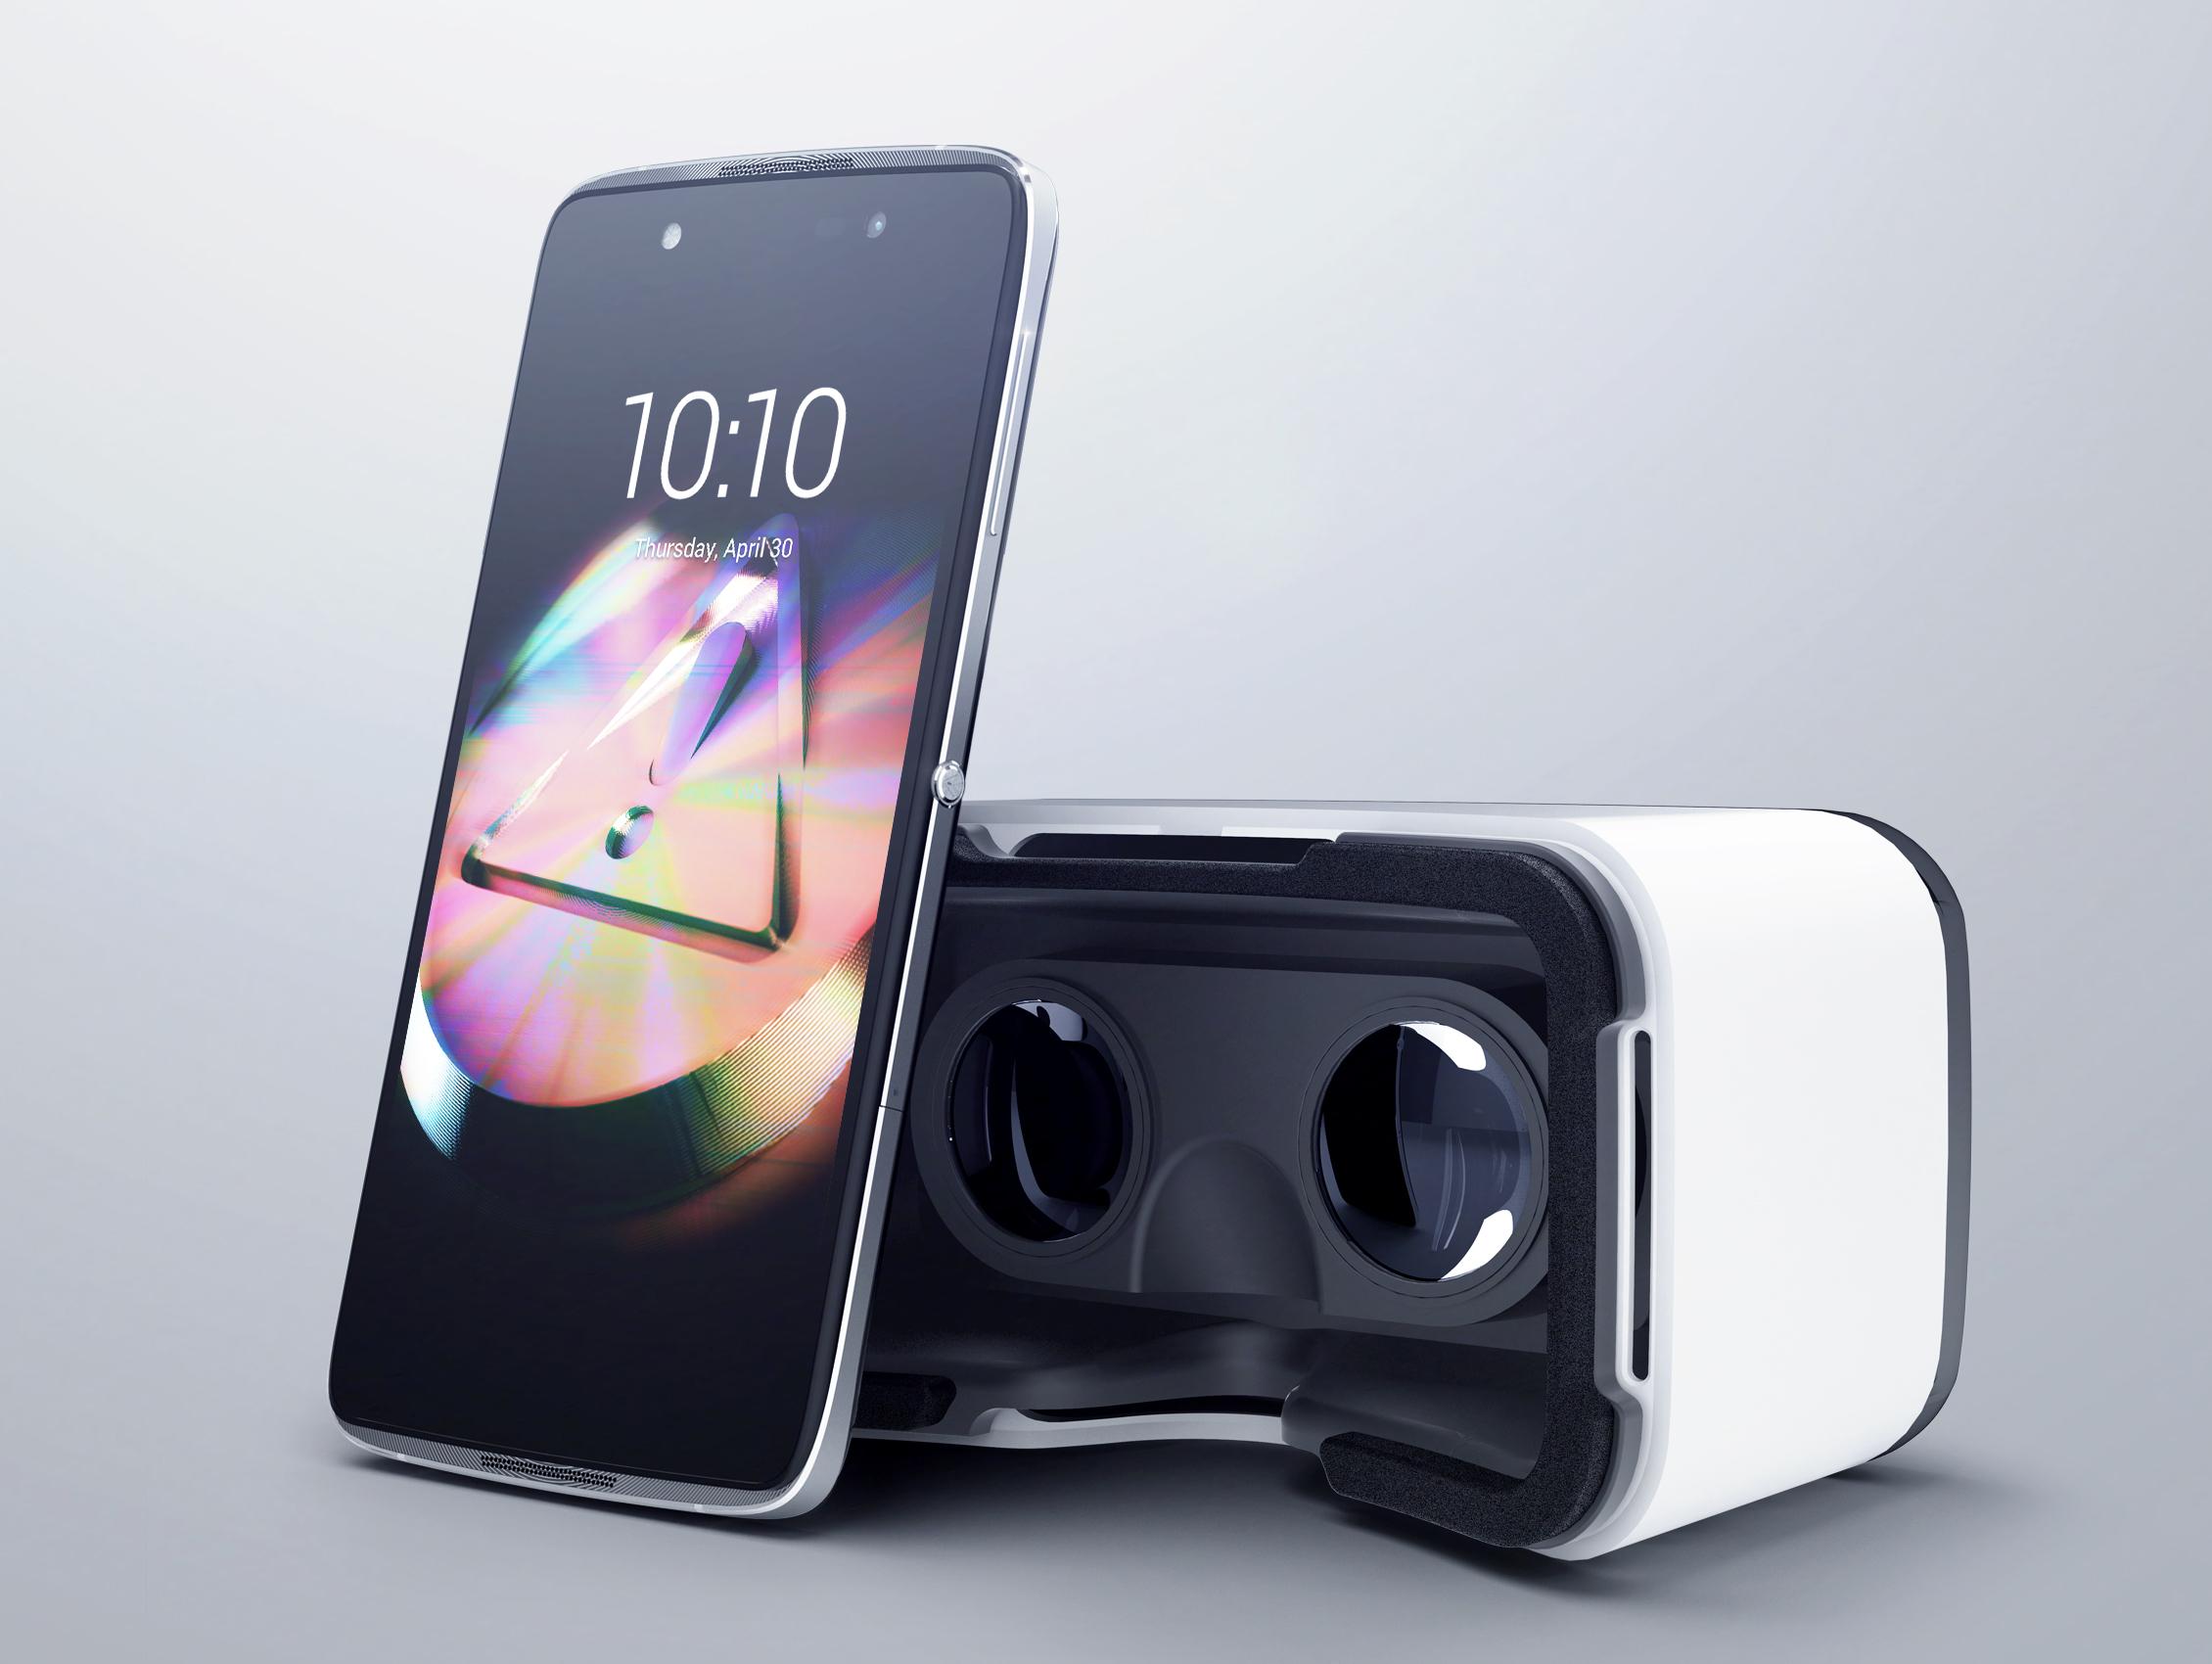 Alcatel Idol se va lansa in Statele Unite si va avea casti VR